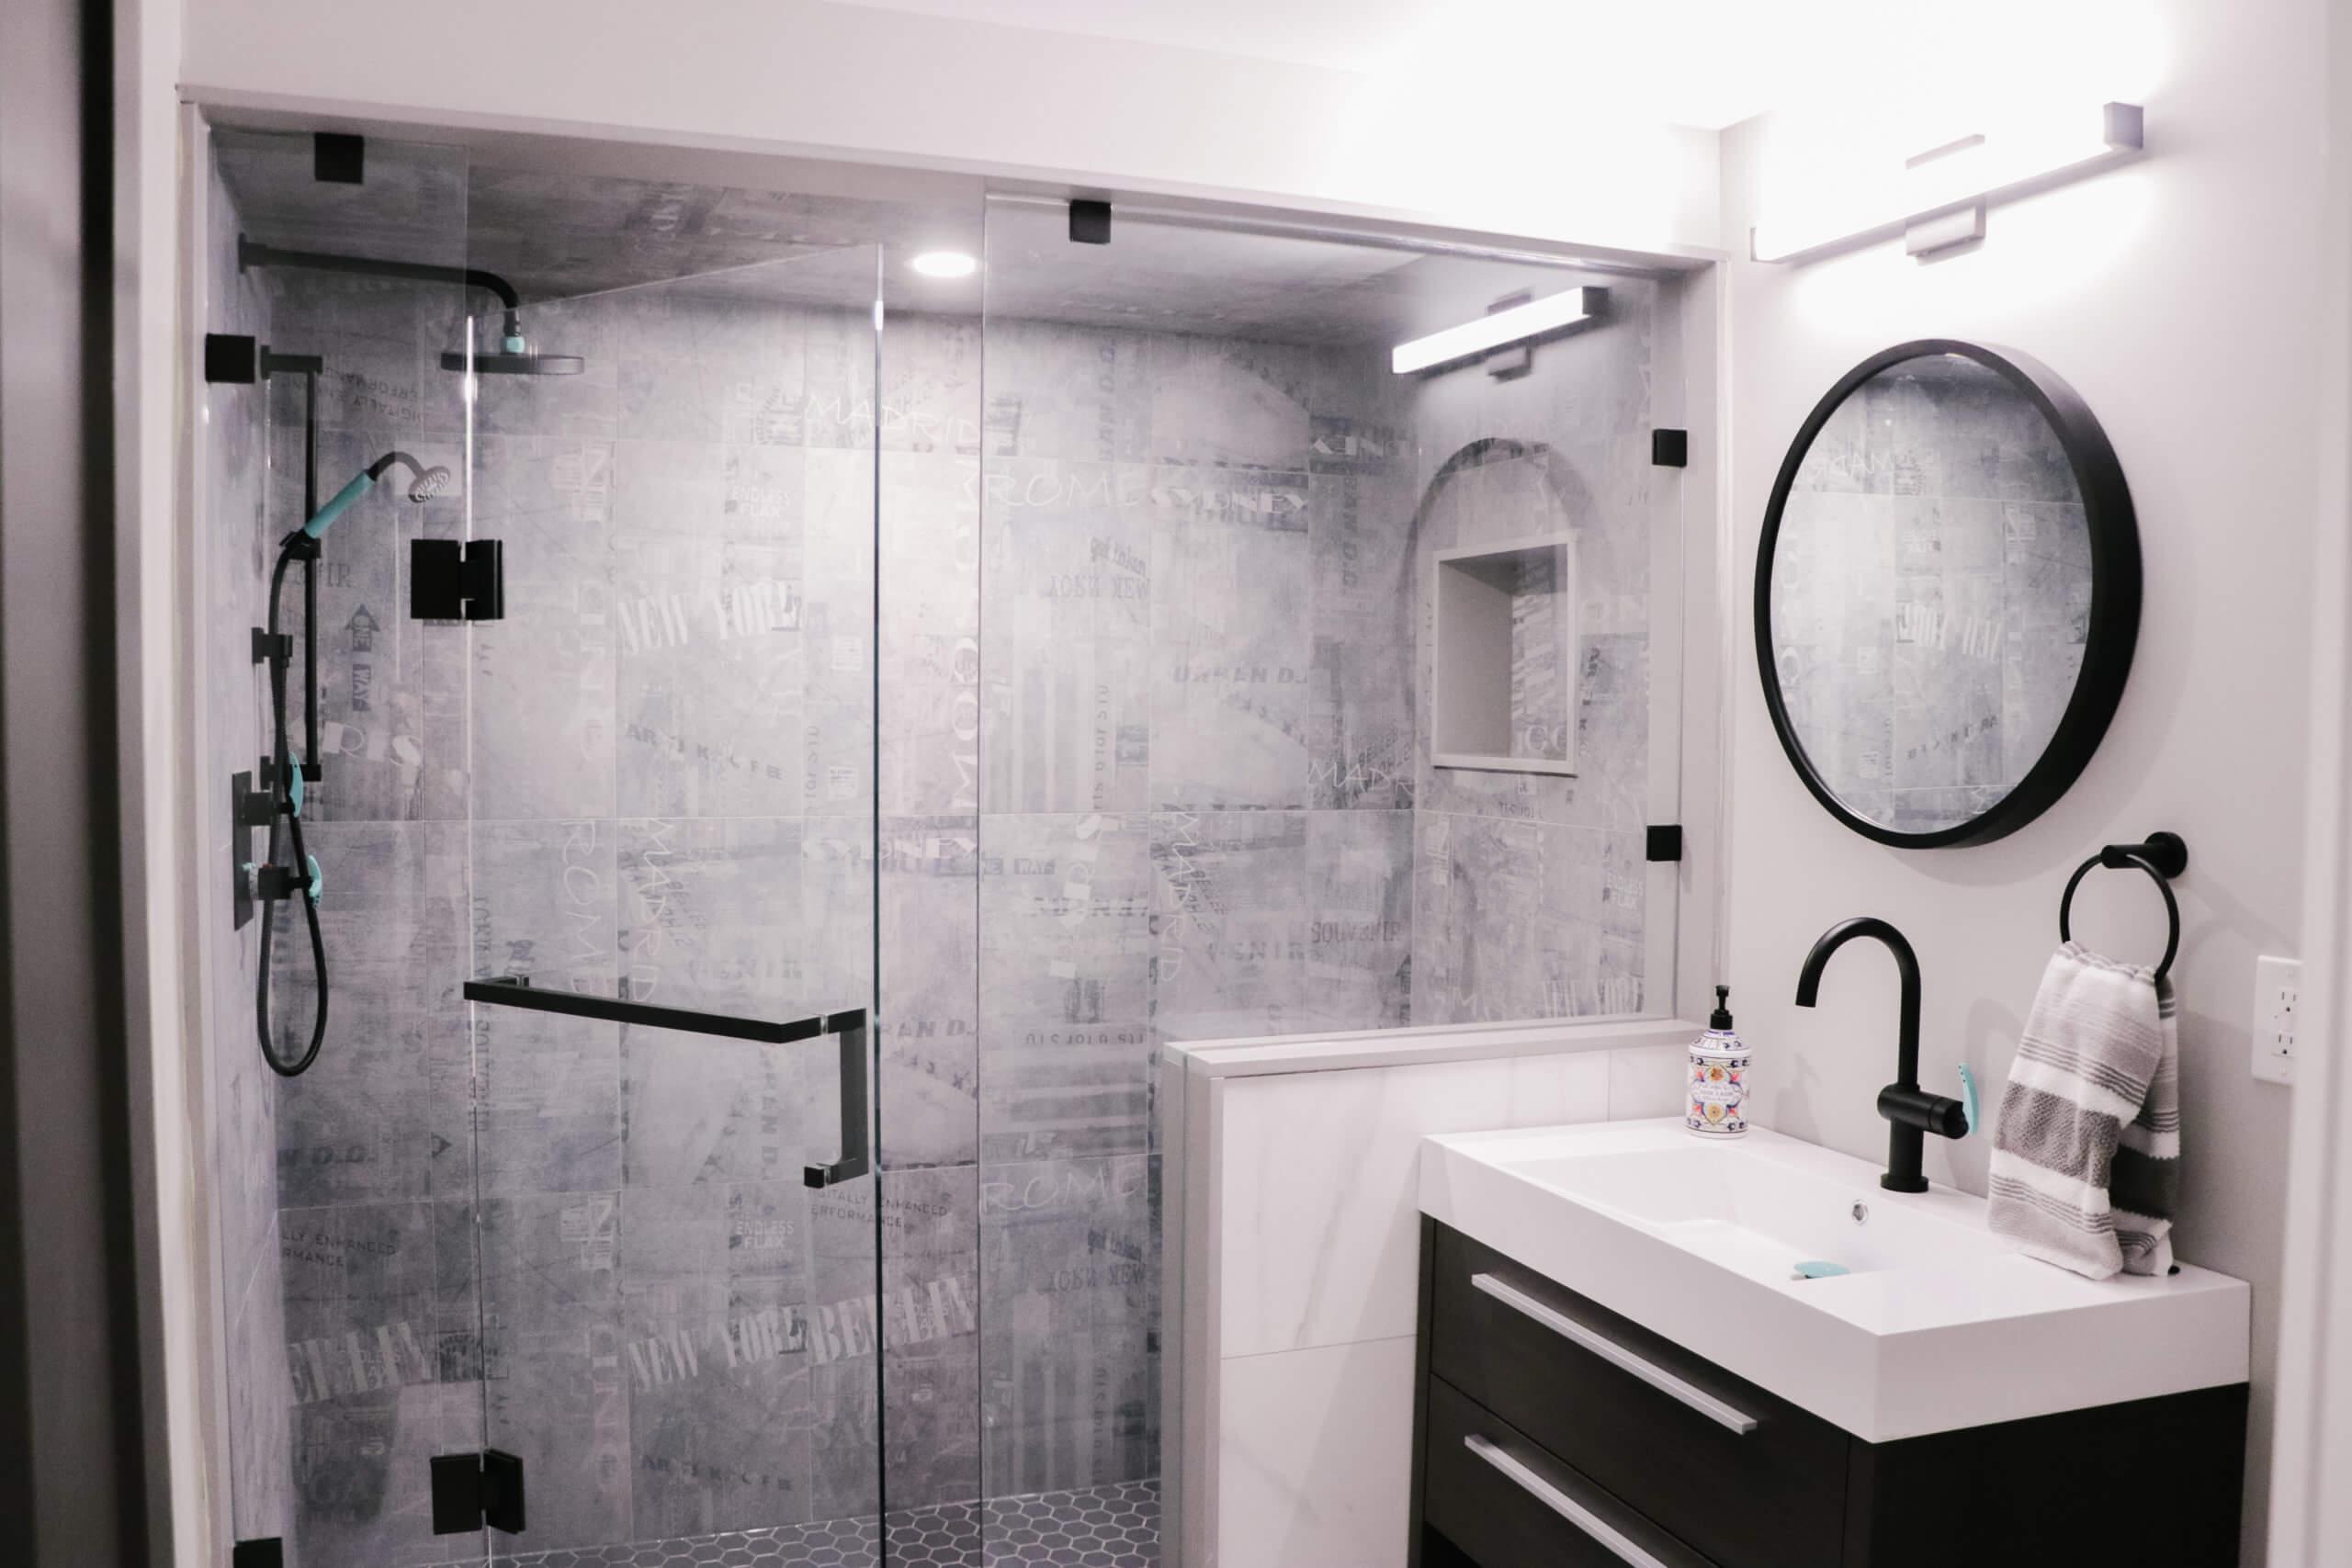 Metropolitan Tile & Stone Improve Canada